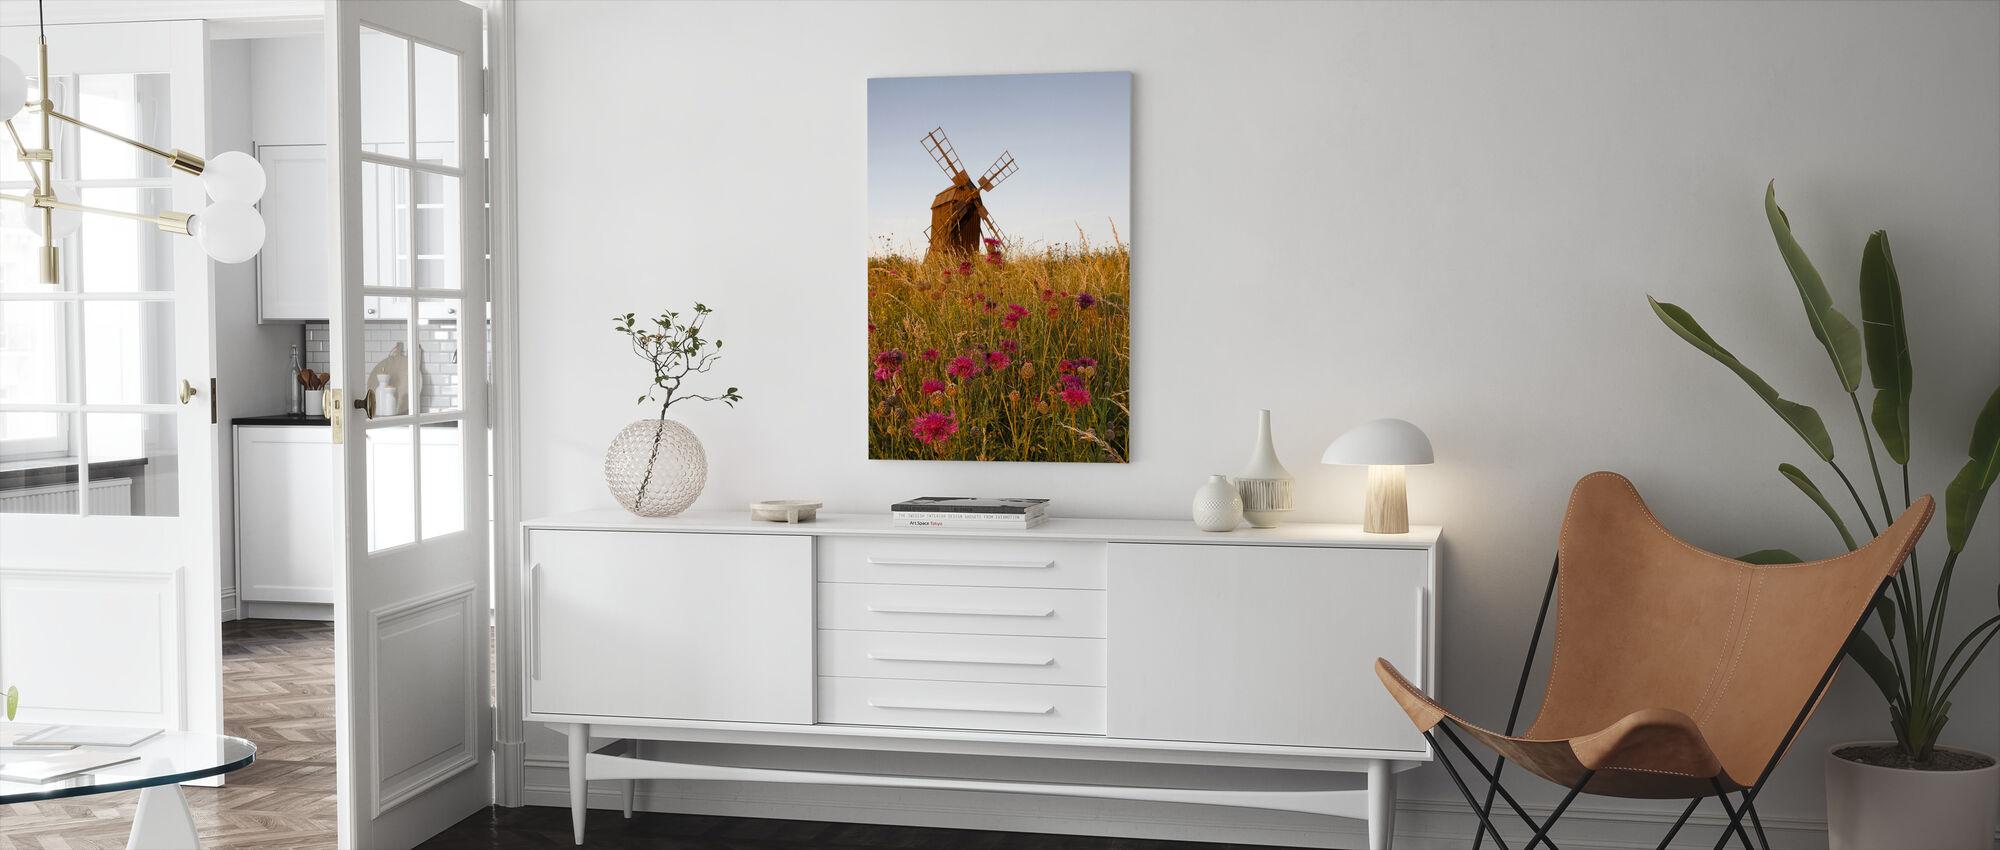 Grainy Windmill - Canvas print - Living Room